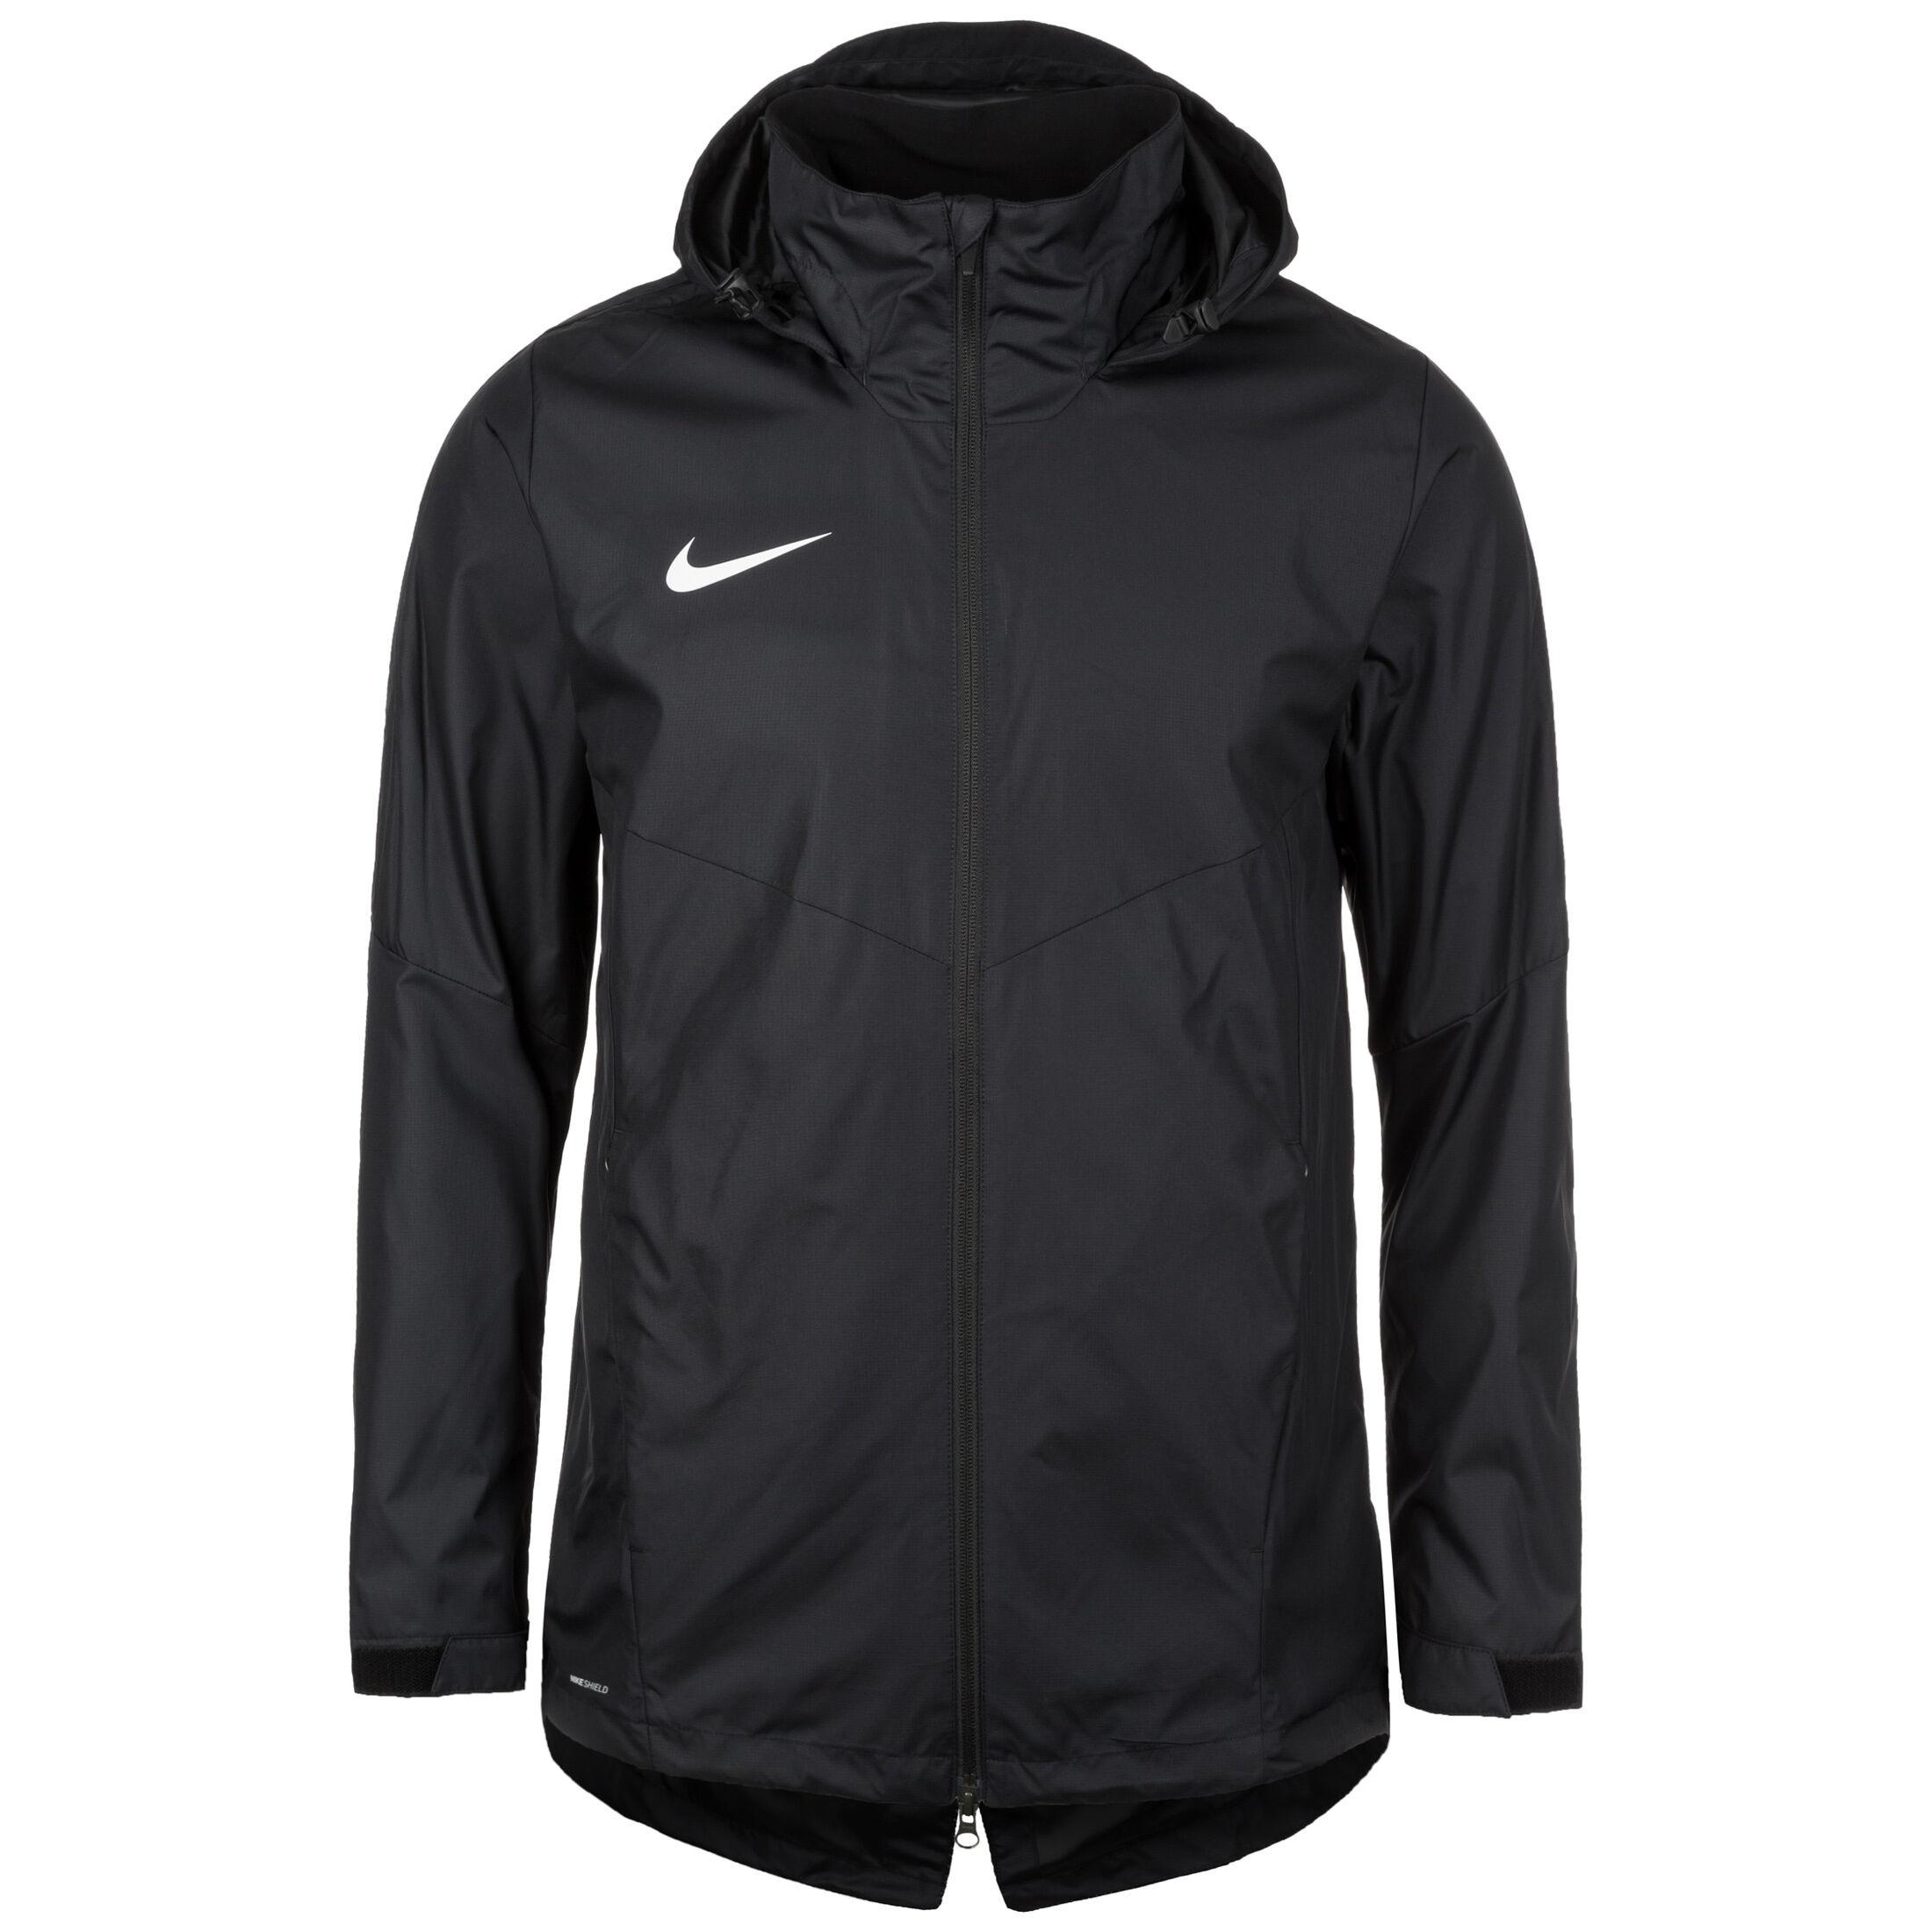 Nike Performance Academy 18 Regenjacke Herren dunkelblau bei